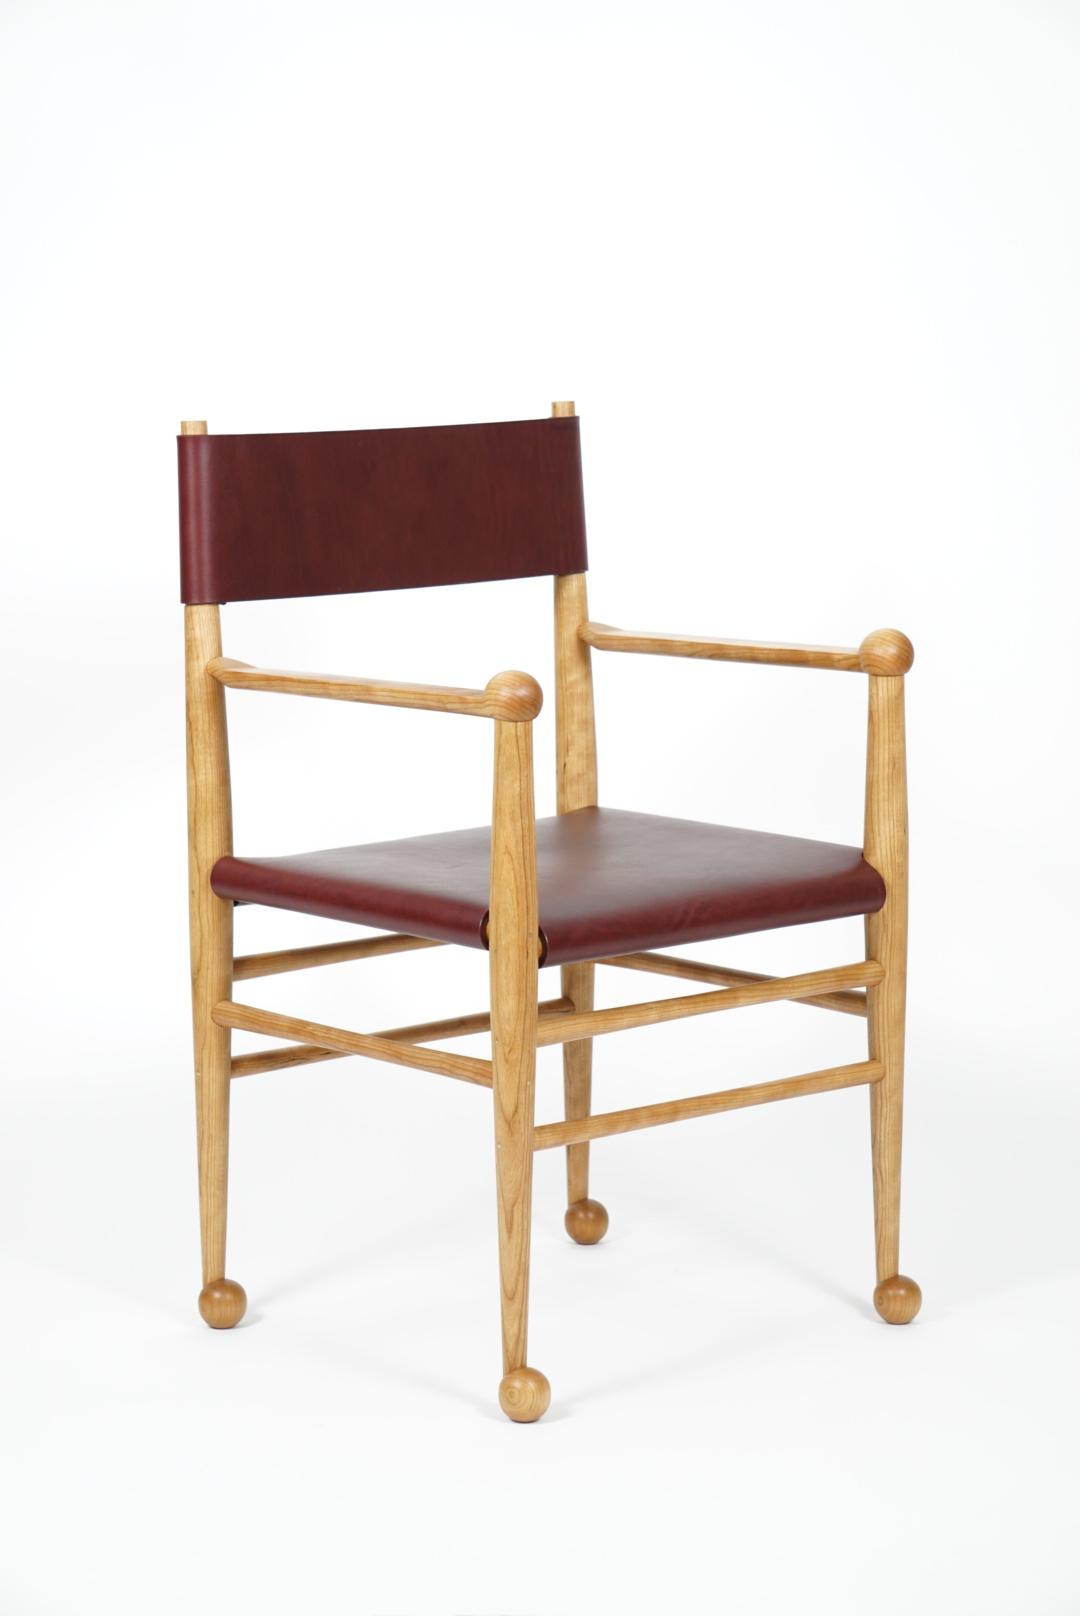 Ball Foot Chair